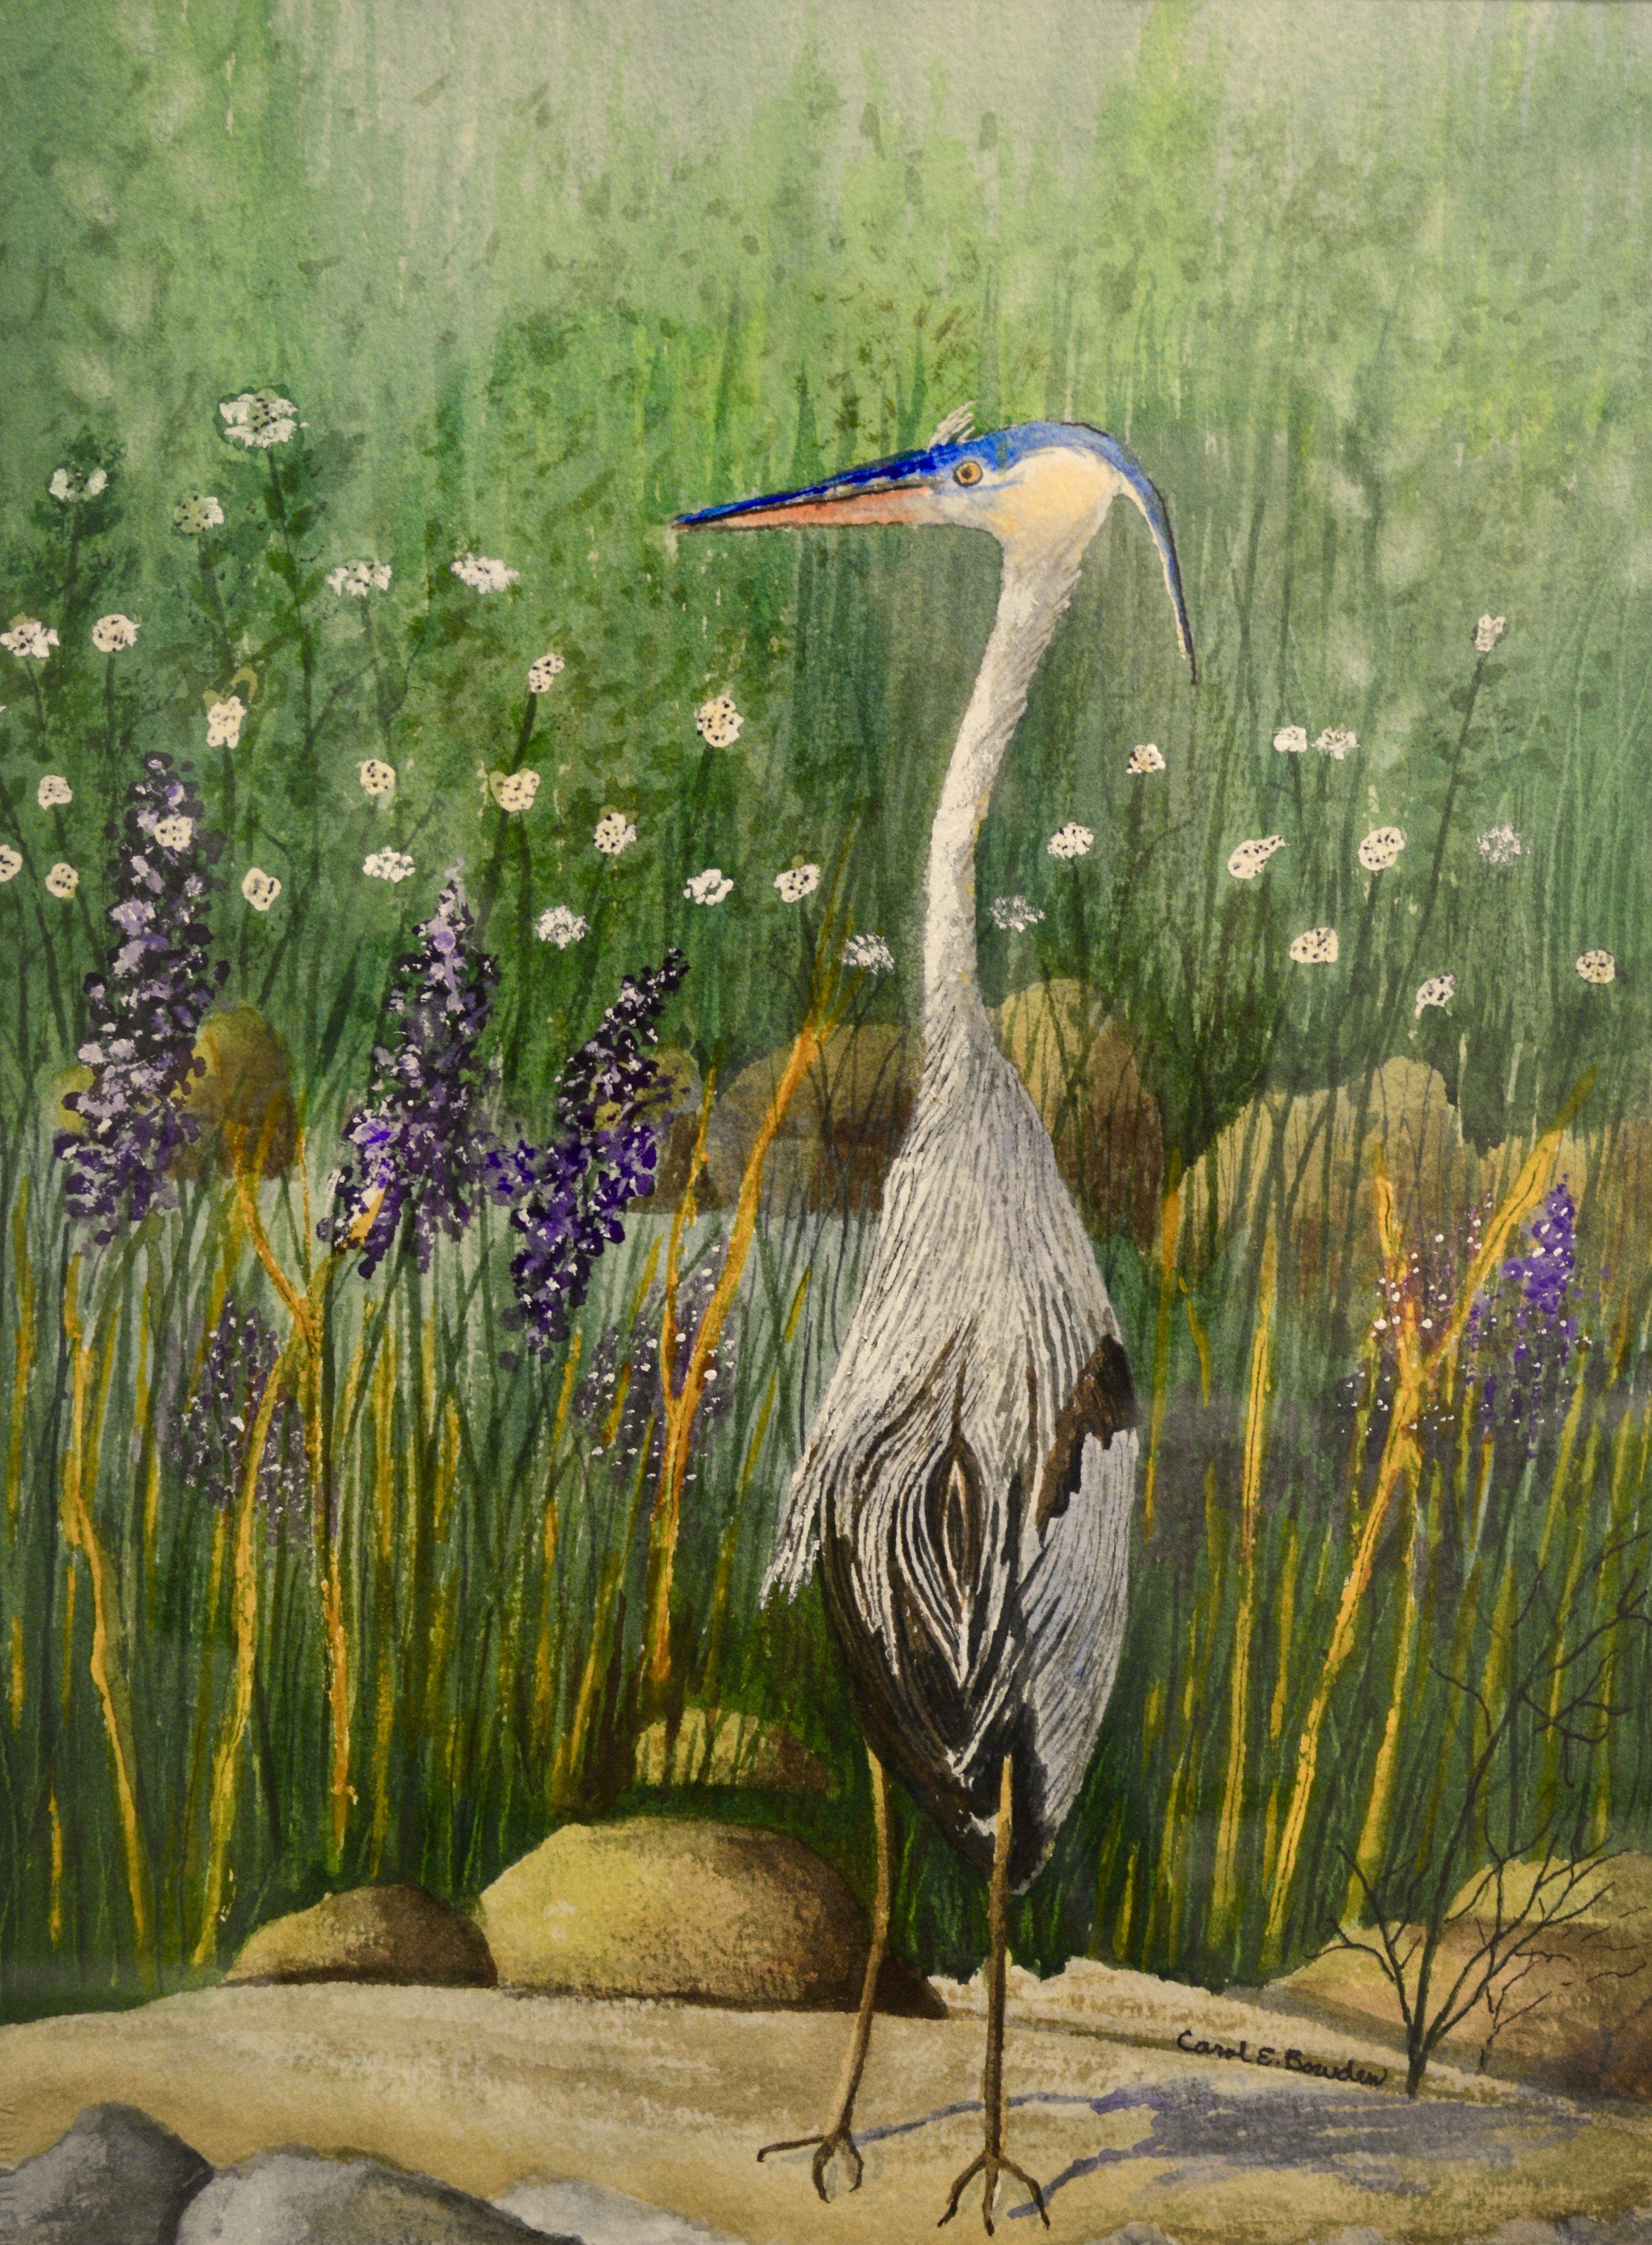 Blue Heron - 18